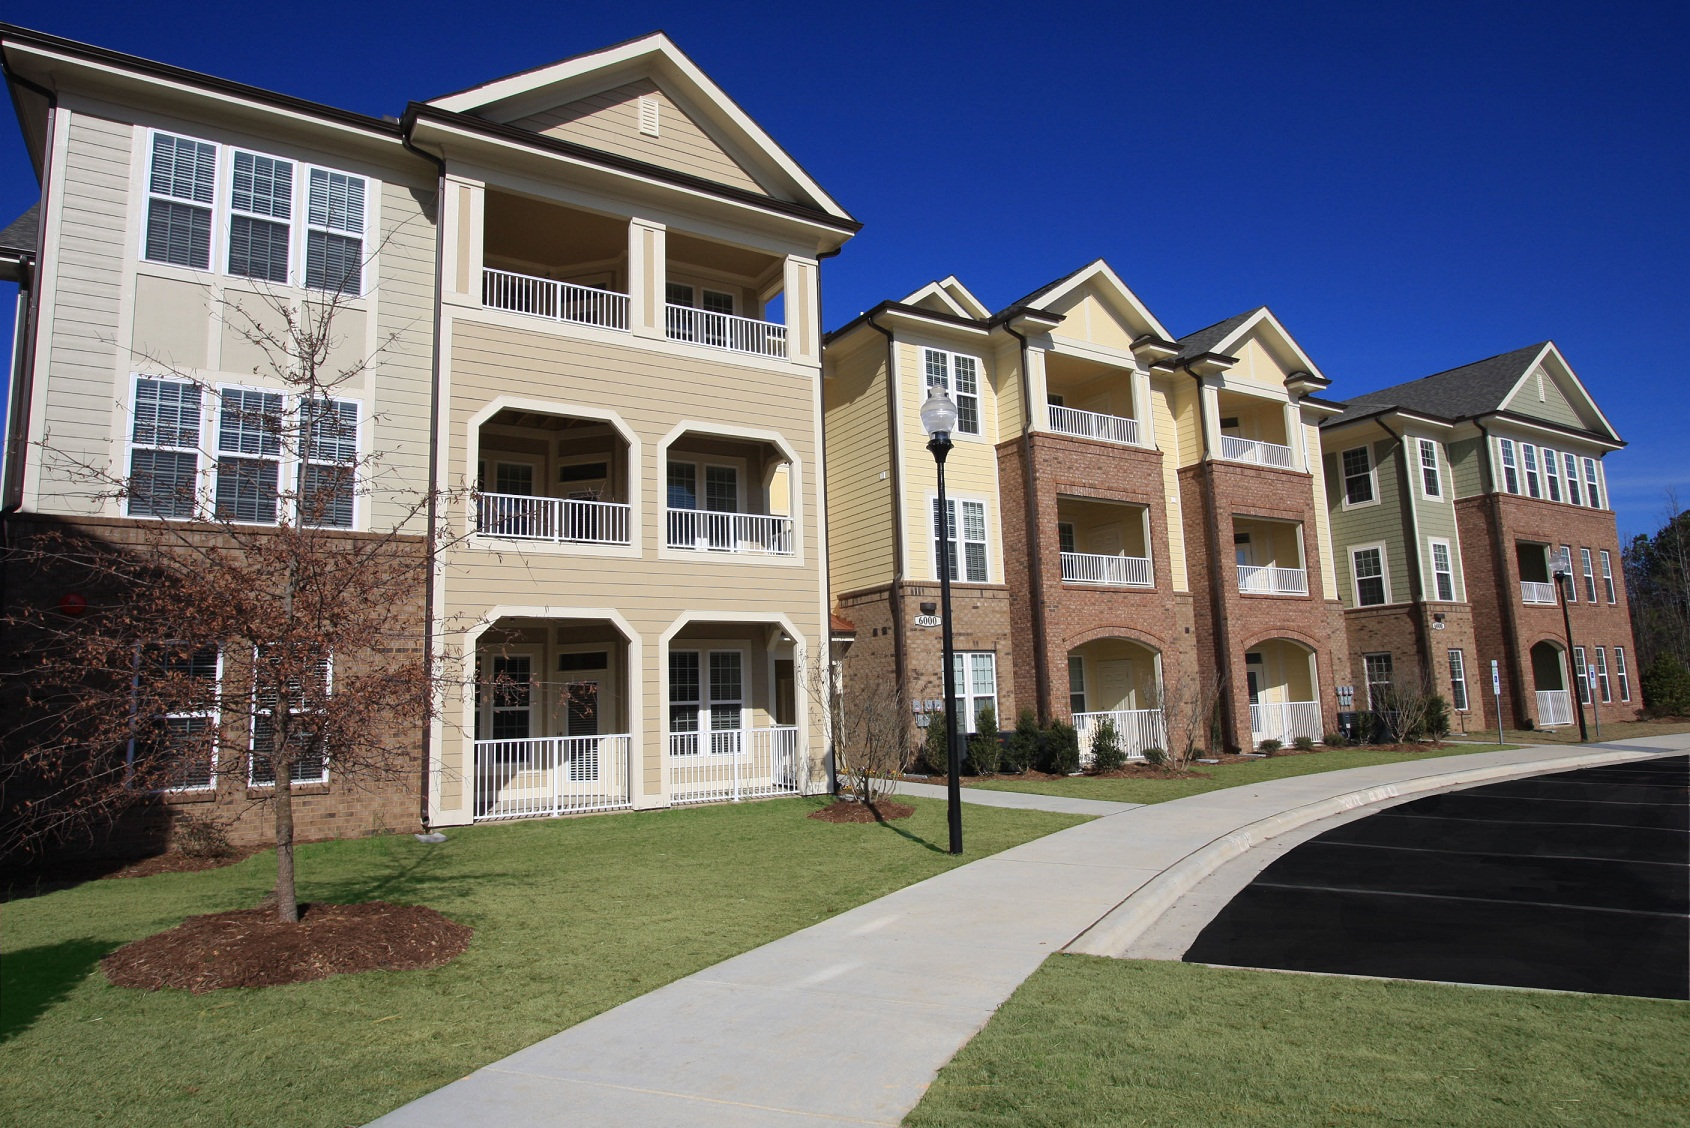 Apartment-complex-Insurance2.jpg